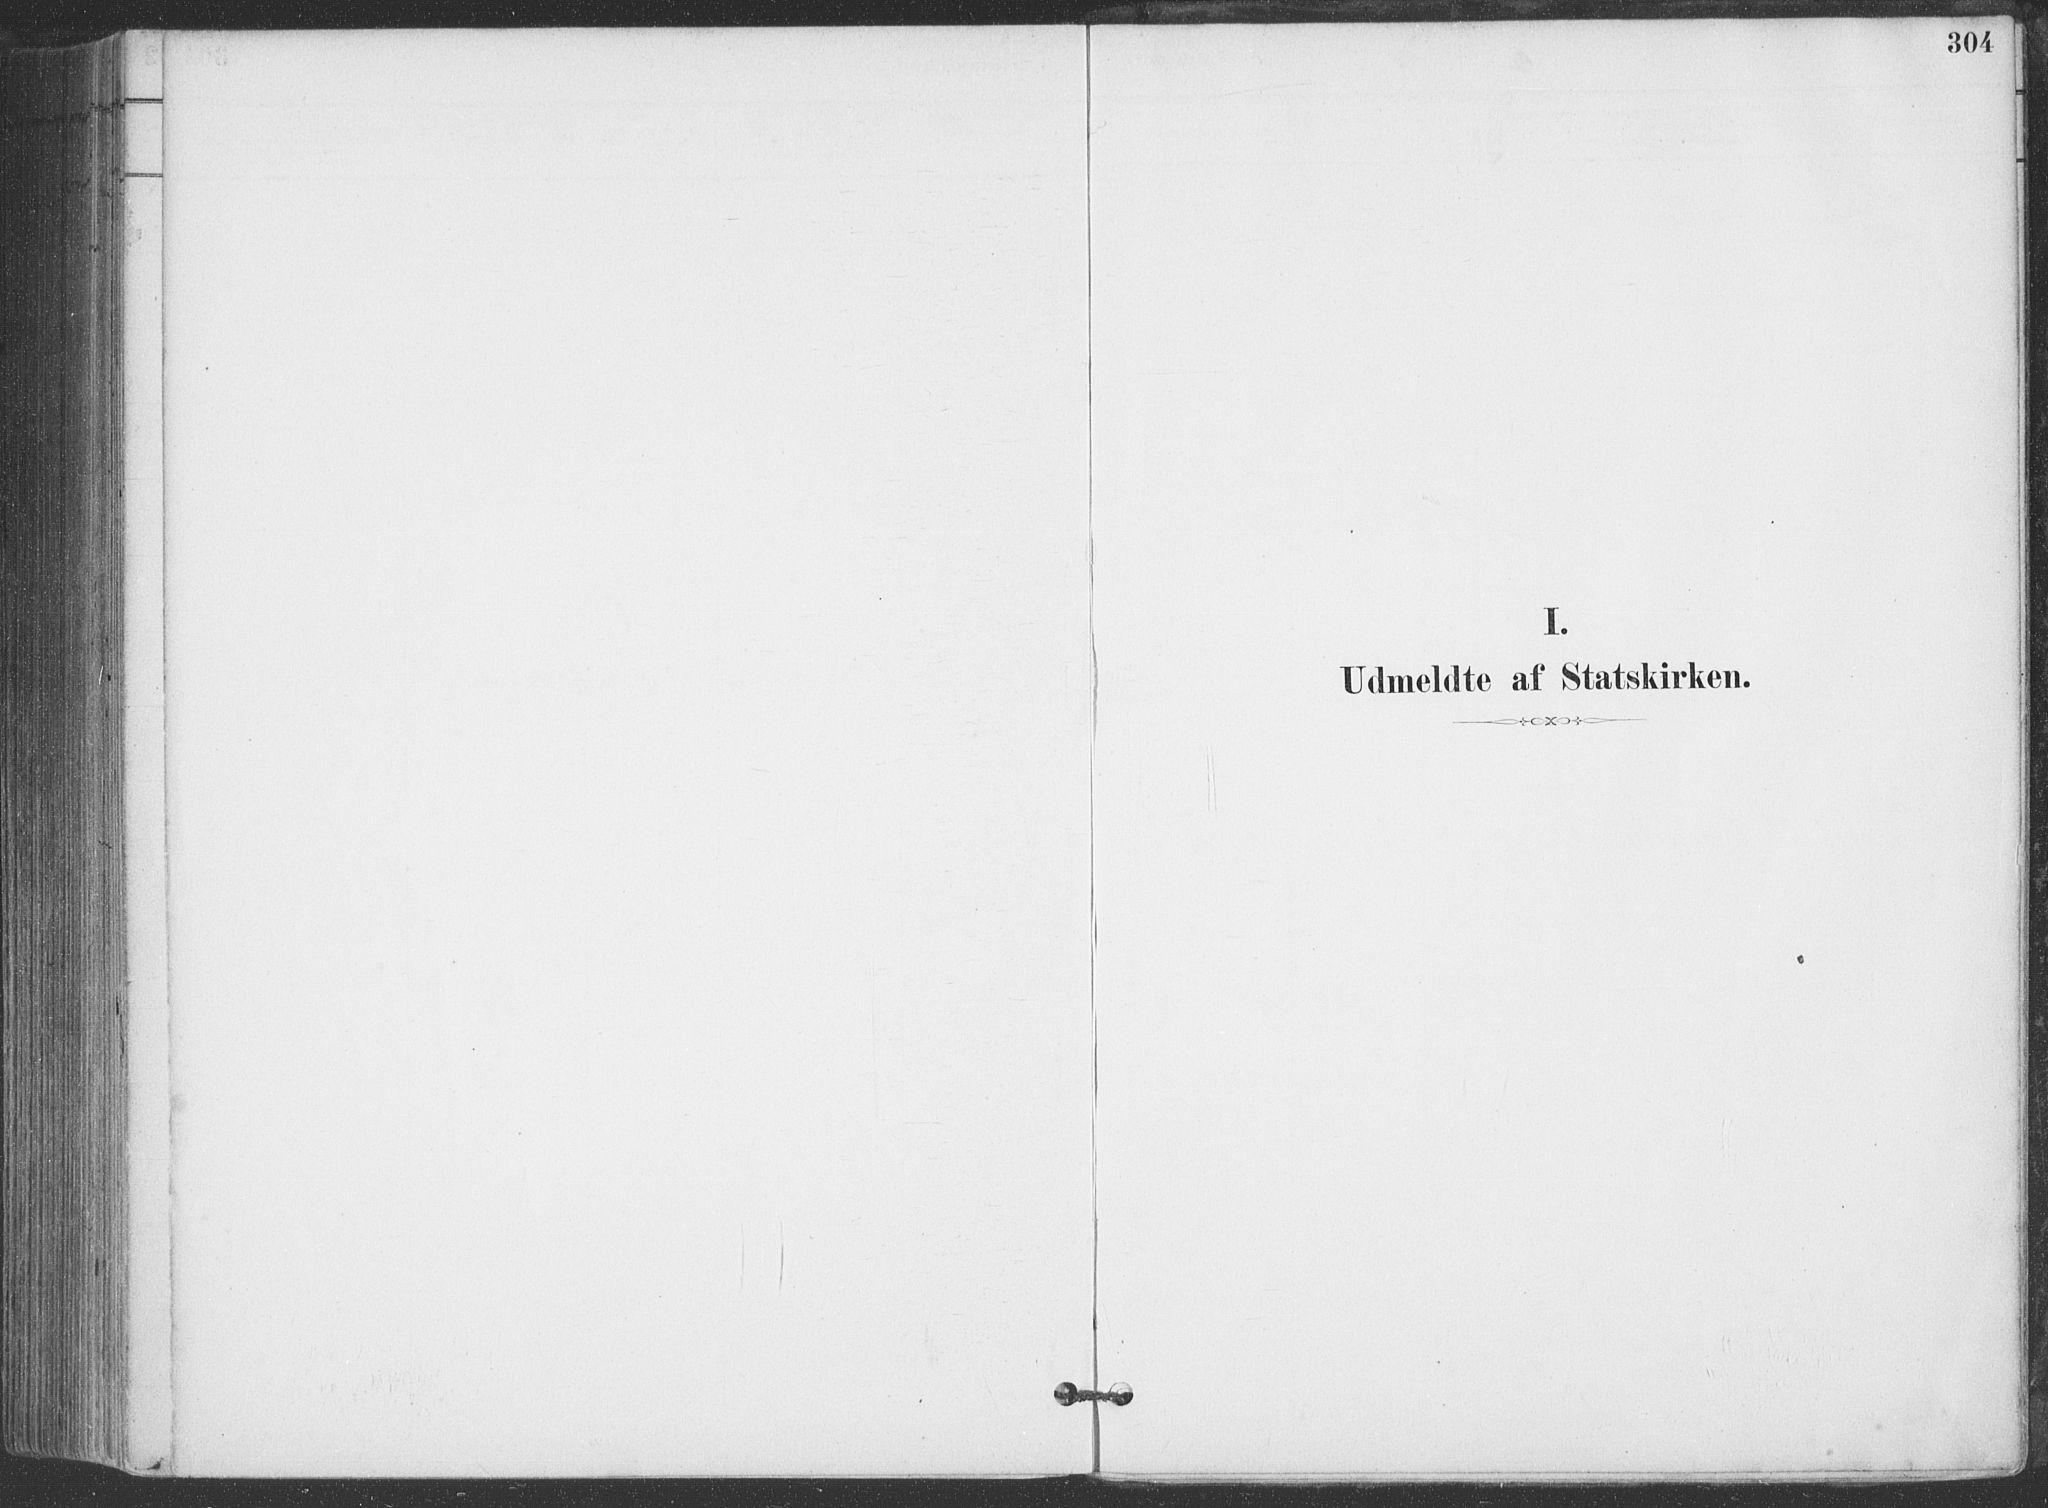 SAKO, Hjartdal kirkebøker, F/Fa/L0010: Ministerialbok nr. I 10, 1880-1929, s. 304